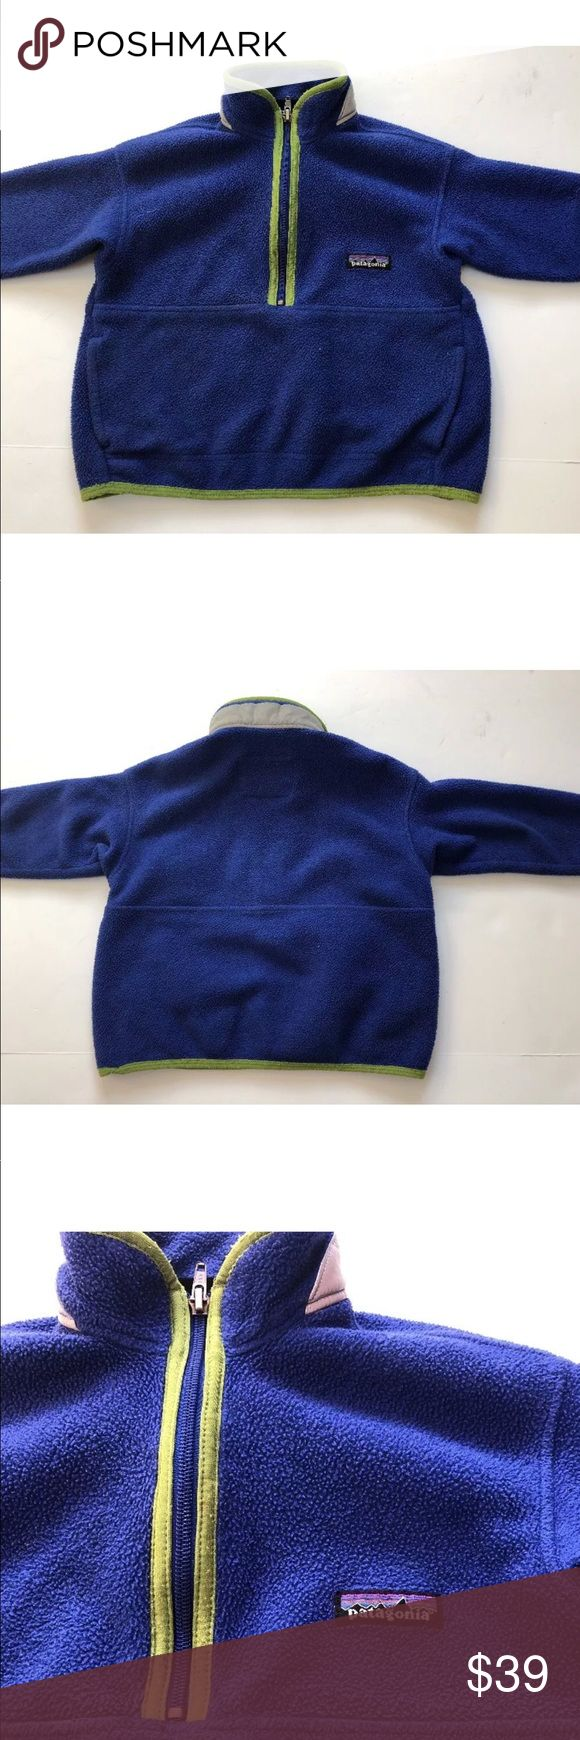 Patagonia kids synchilla fleece jacket size 3-4 Patagonia blue kids synchilla pullover fleece jacket size 3-4 XXS Patagonia Jackets & Coats